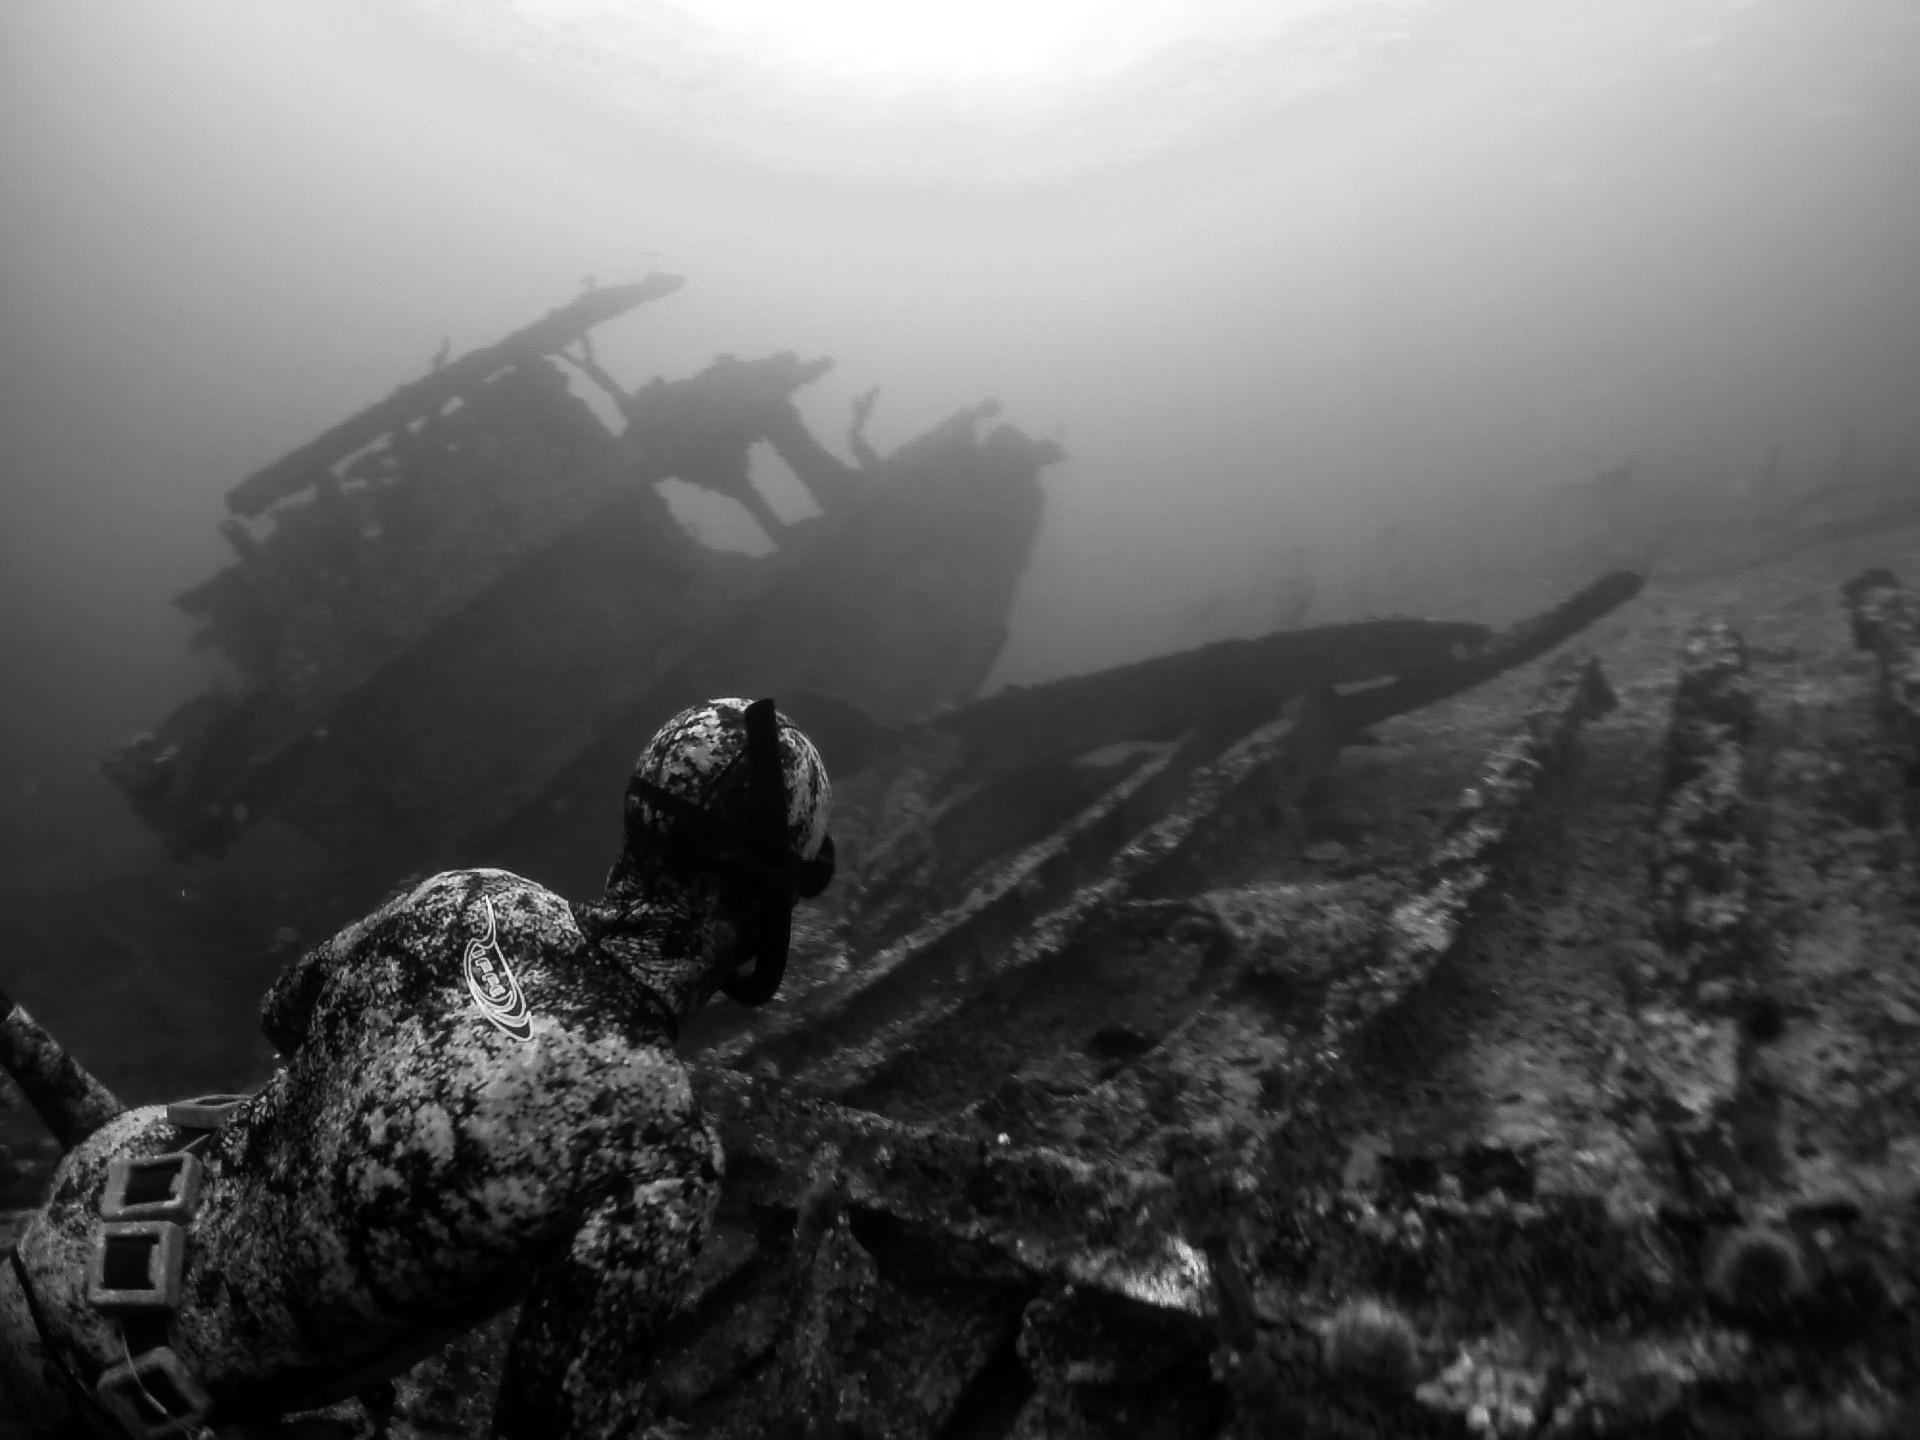 N. Schmidt and C. Adair, Exploring Sunken History in the Gulf Islands off Vancouver Island. Photo: C. Adair